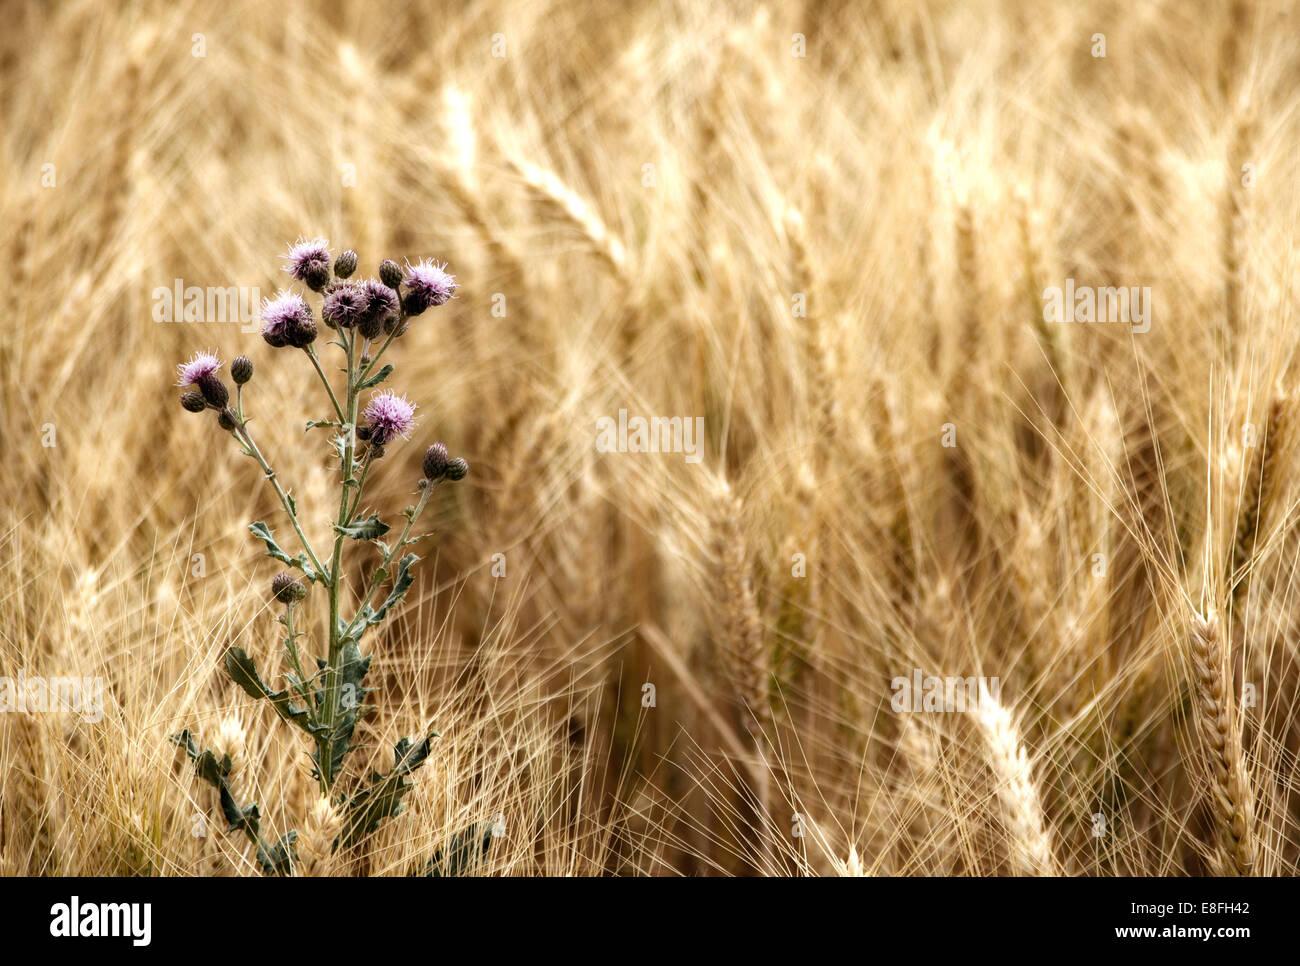 Distel im Weizenfeld Stockbild